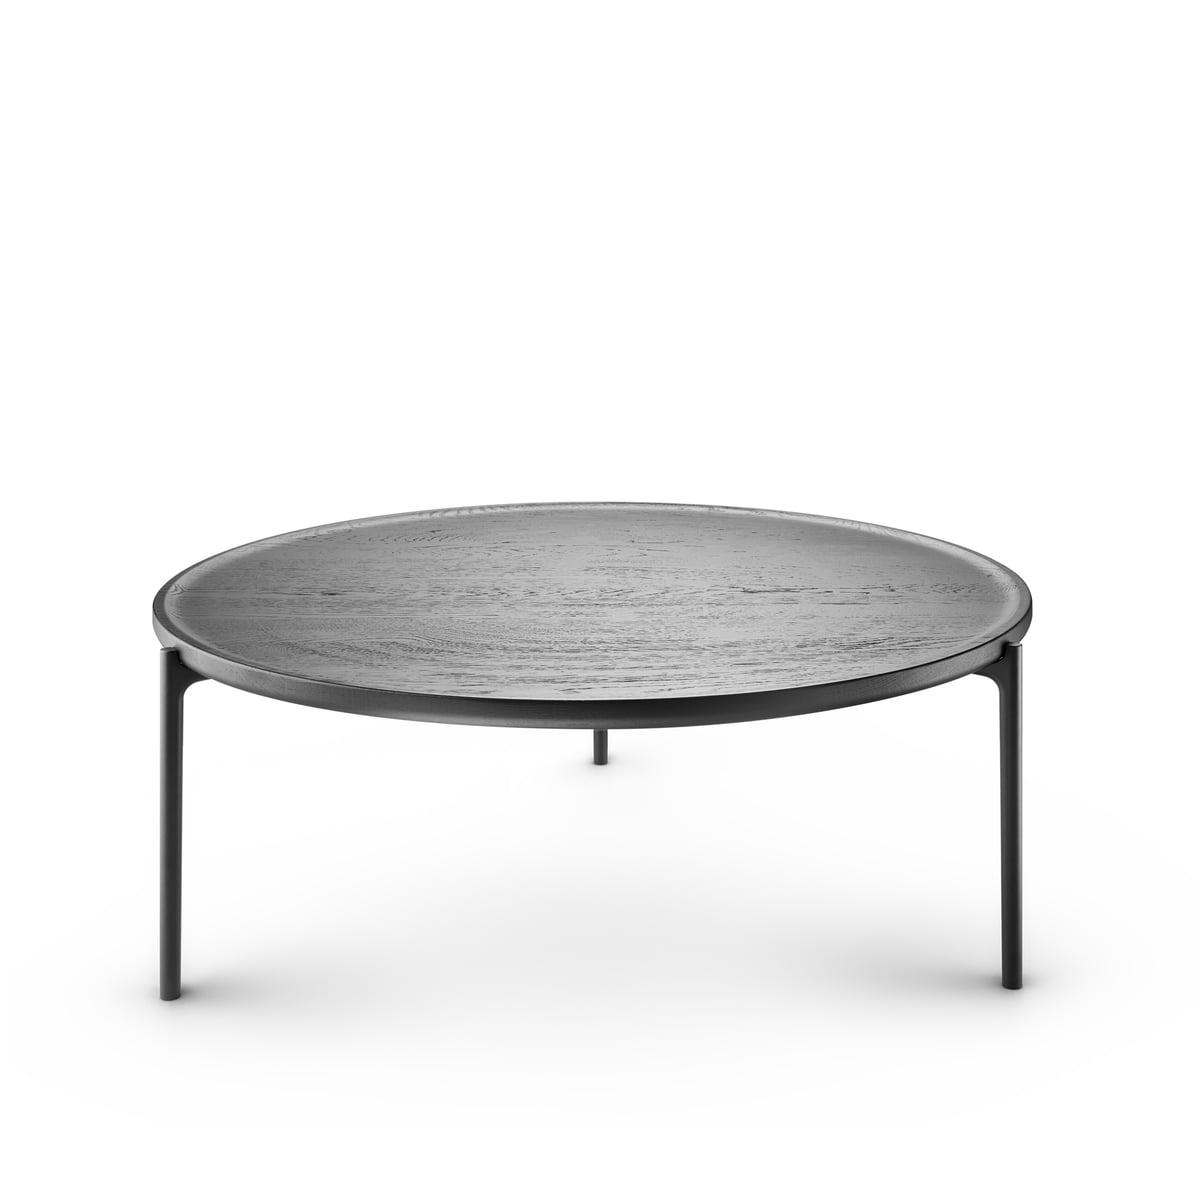 - Eva Solo - Savoye Coffee Table (round) Connox